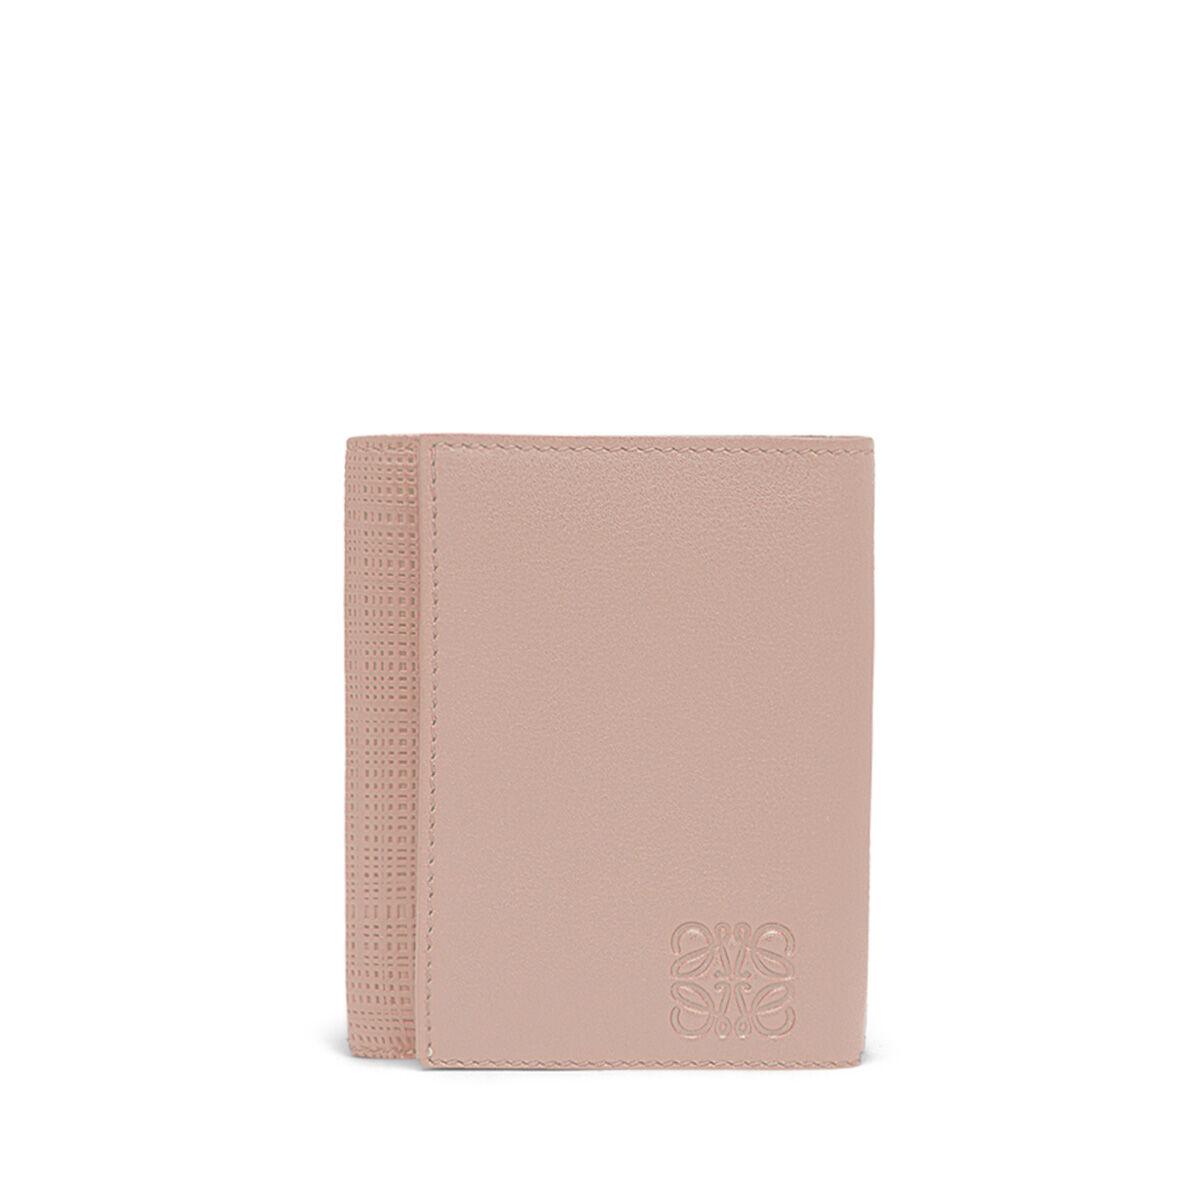 LOEWE Linen Trifold Wallet Blush front